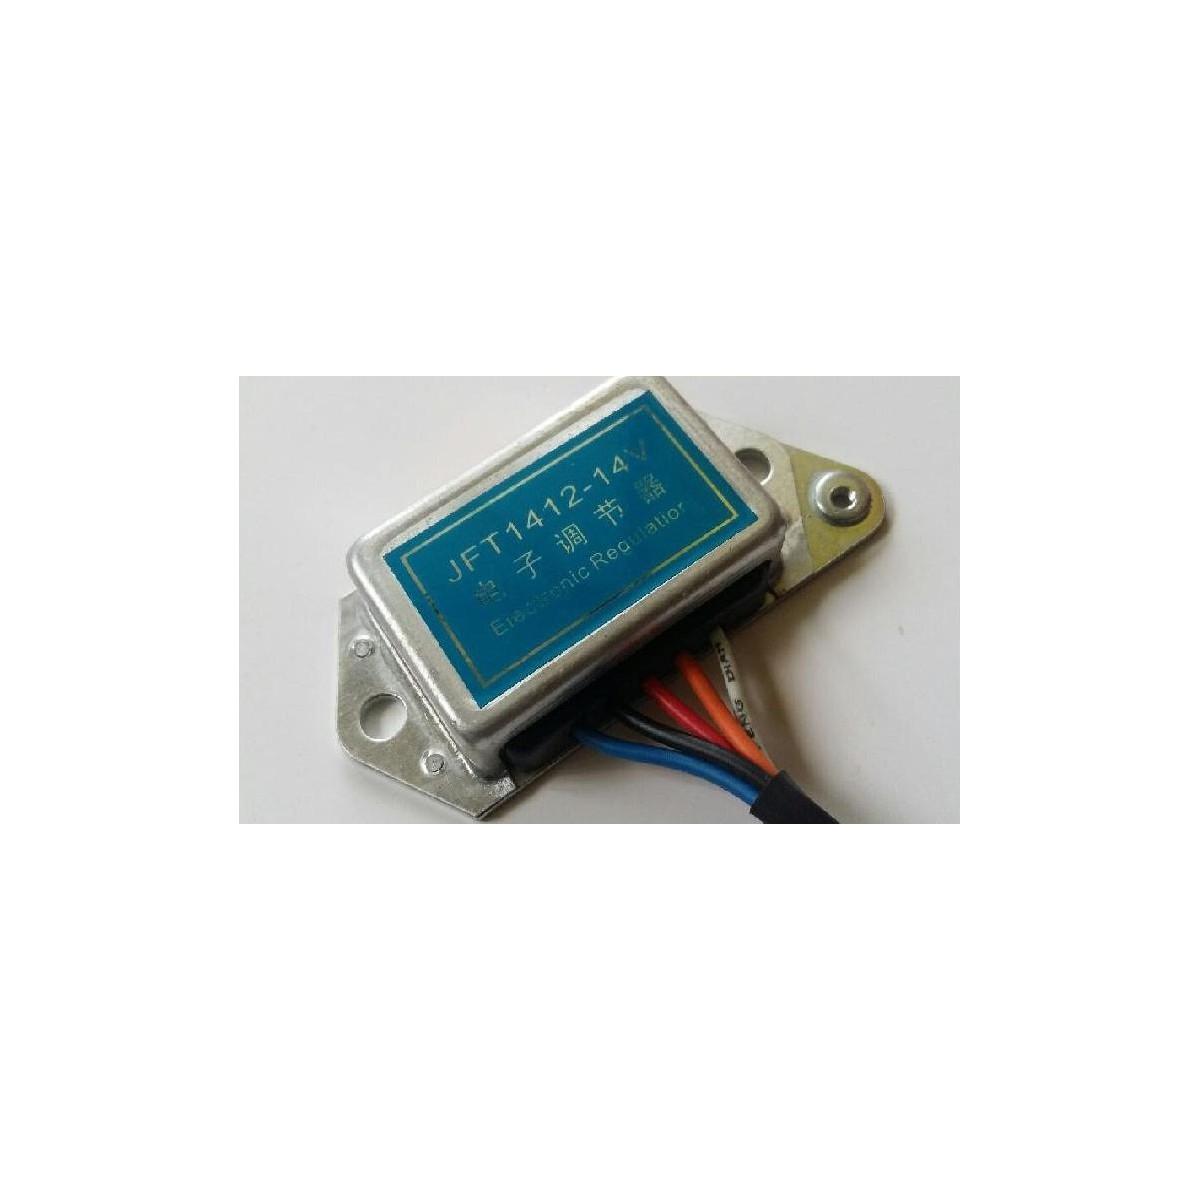 Spannungsregler JFT1412 Jinma JM204